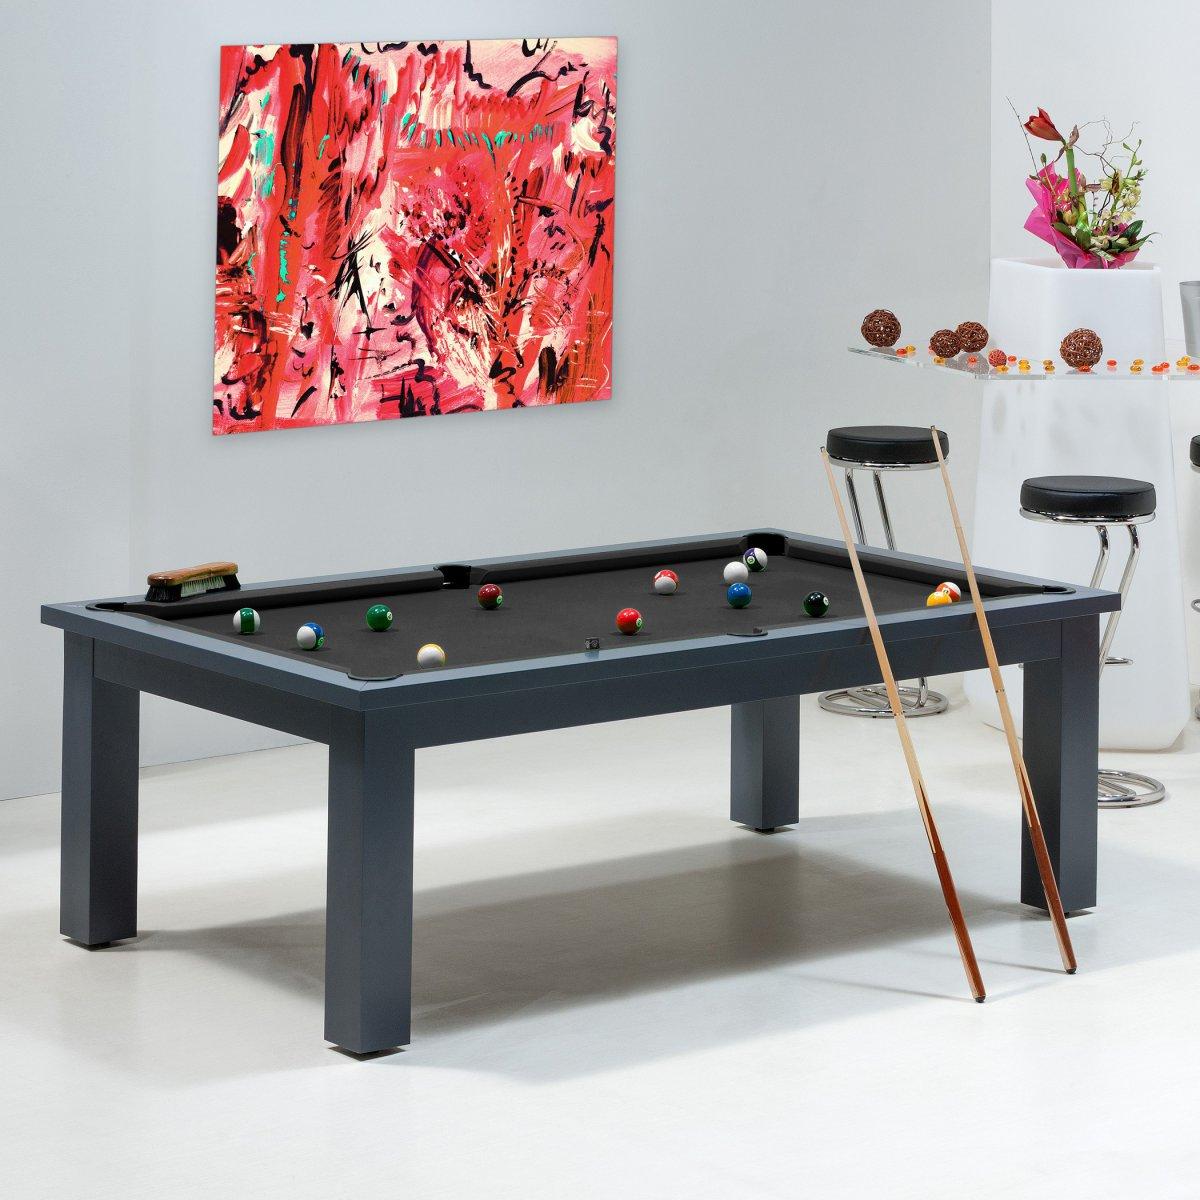 fabriquer un billard transformable en table systeme d. Black Bedroom Furniture Sets. Home Design Ideas